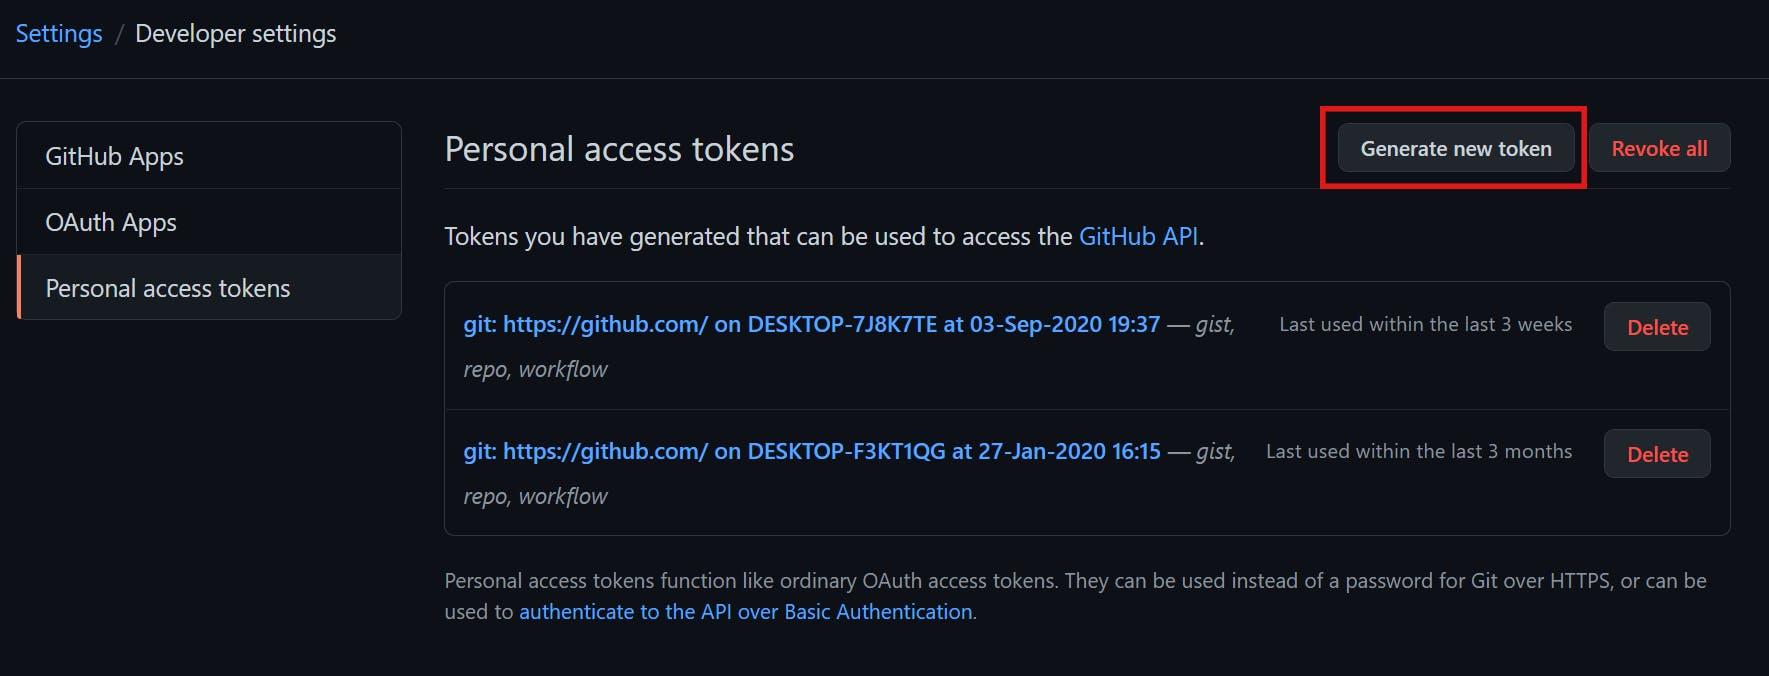 generate new token.PNG